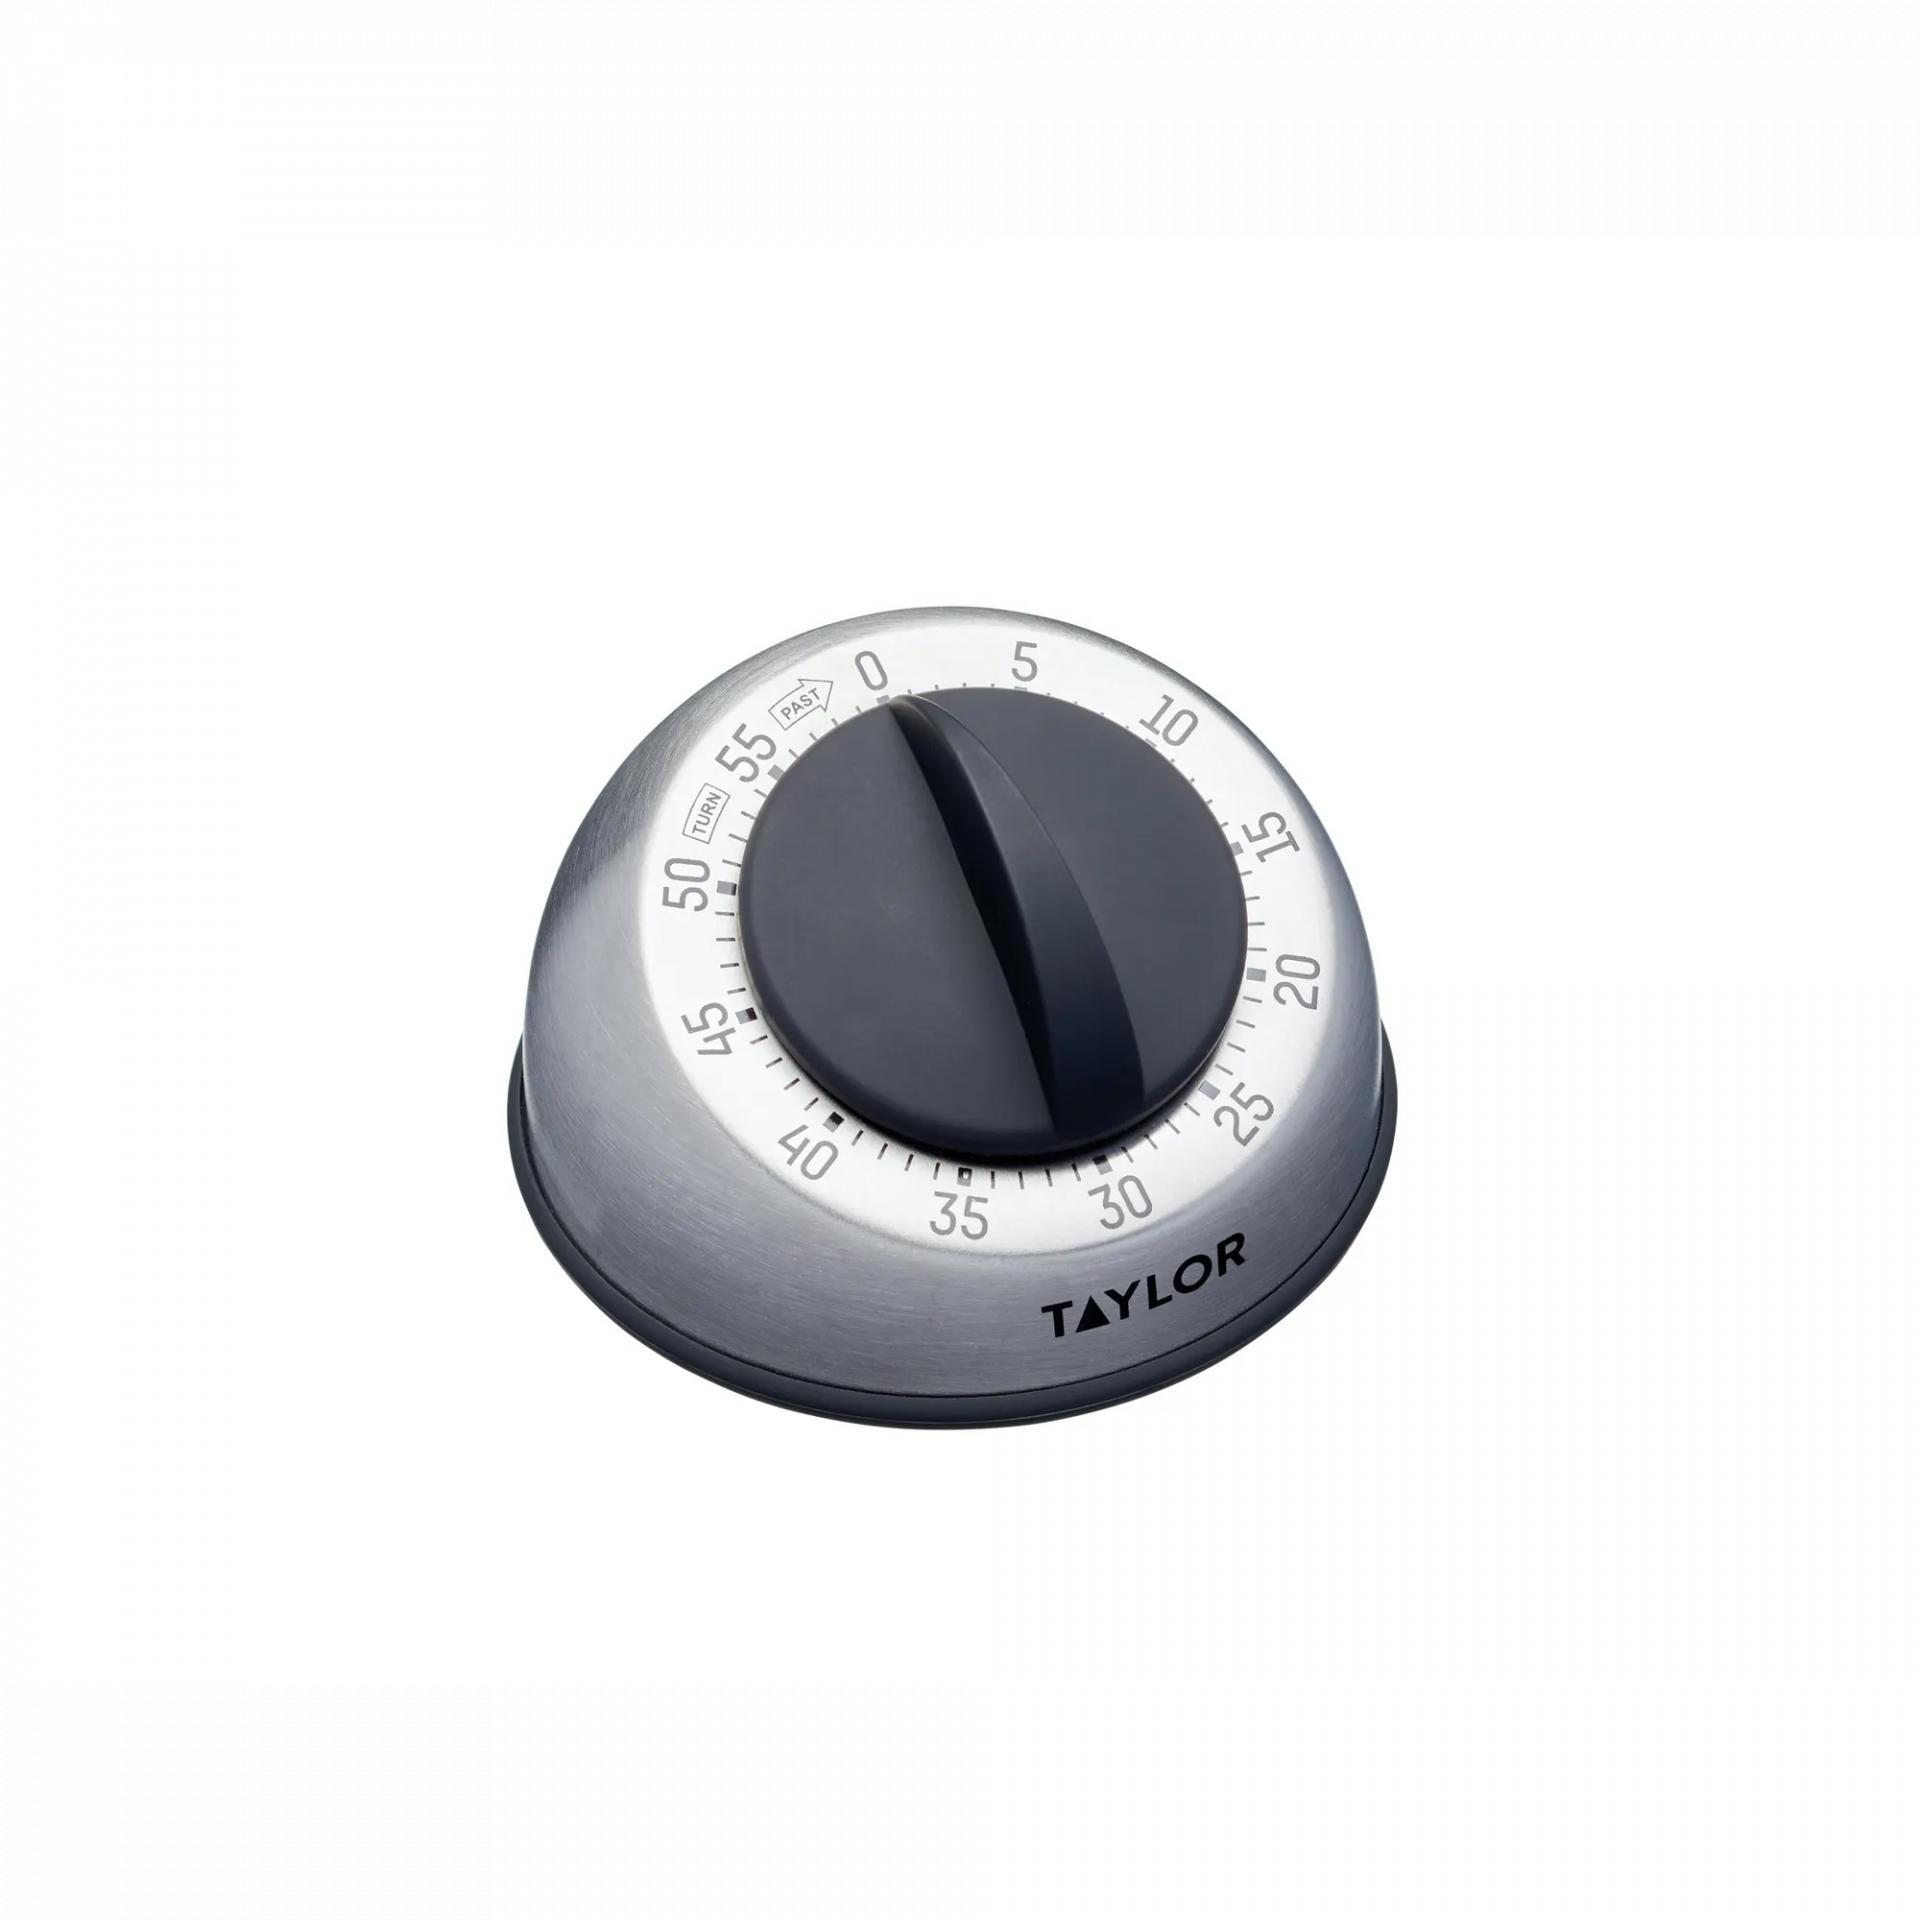 Kitchen Craft Kuchyňská minutka Dial Classic, stříbrná barva, kov